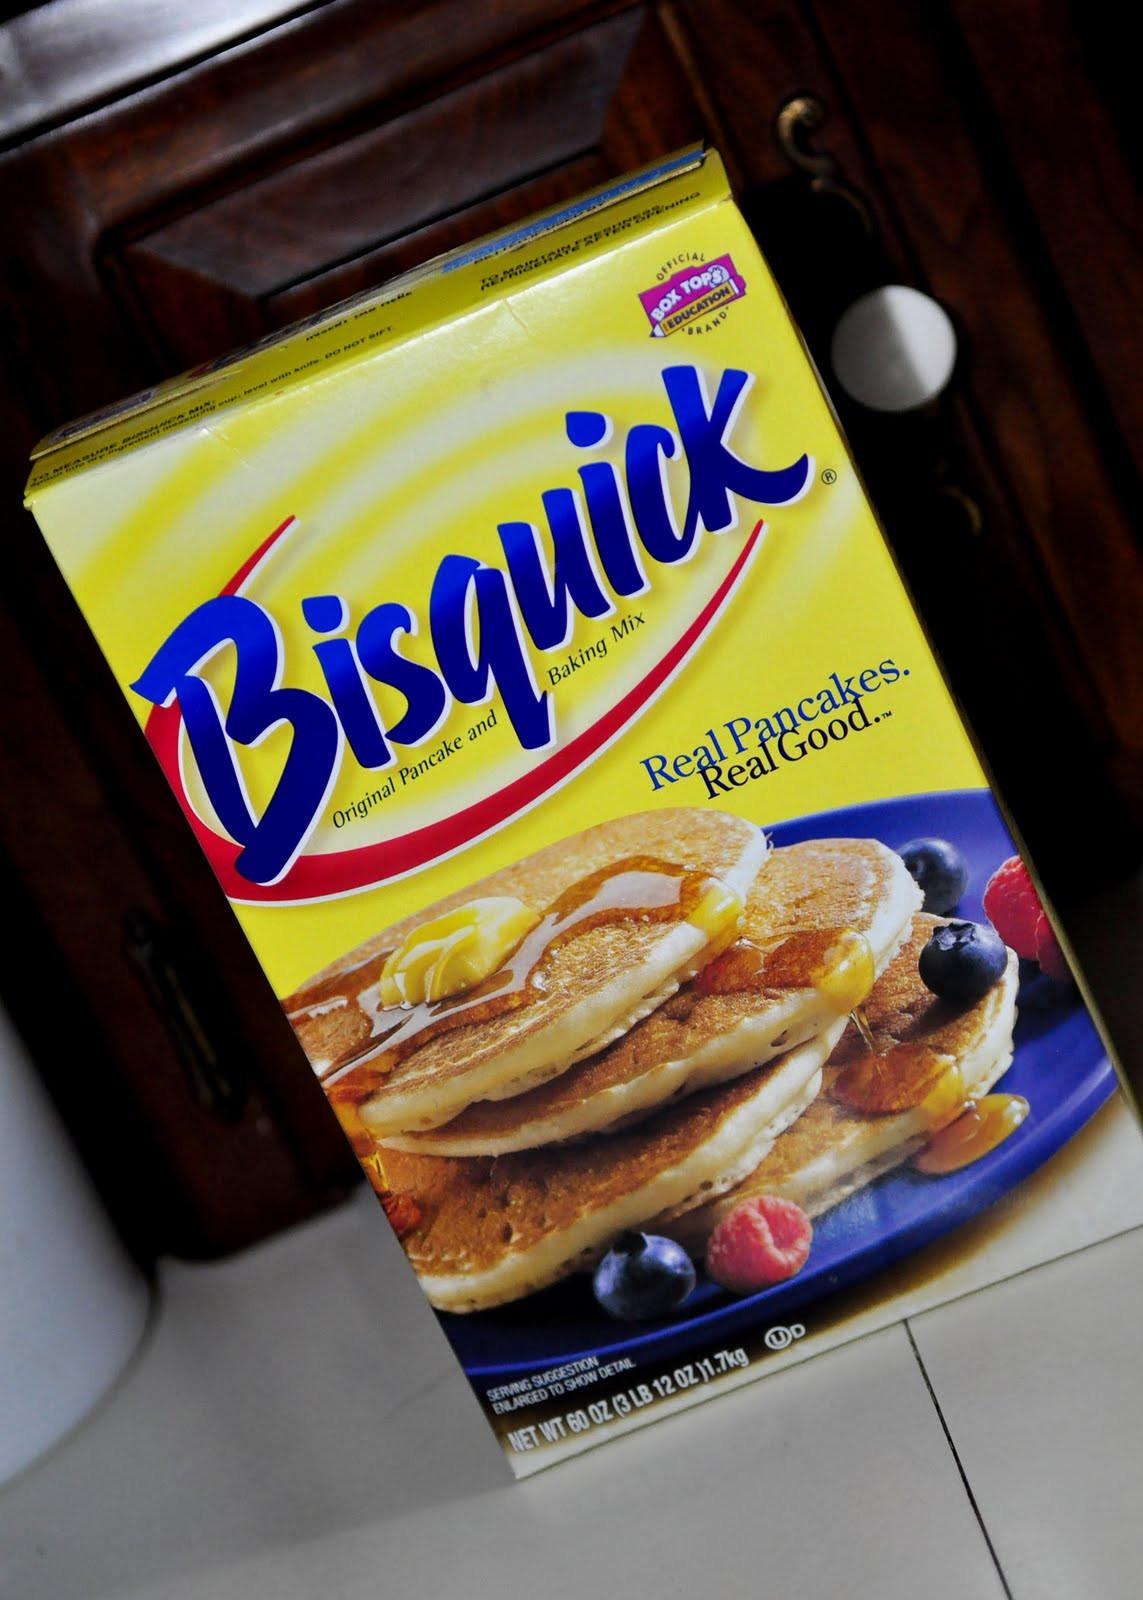 Bisquick Shortcake Recipe 9X13 Pan  This Farm Family s Life Easy Peasy Strawberry Shortcake